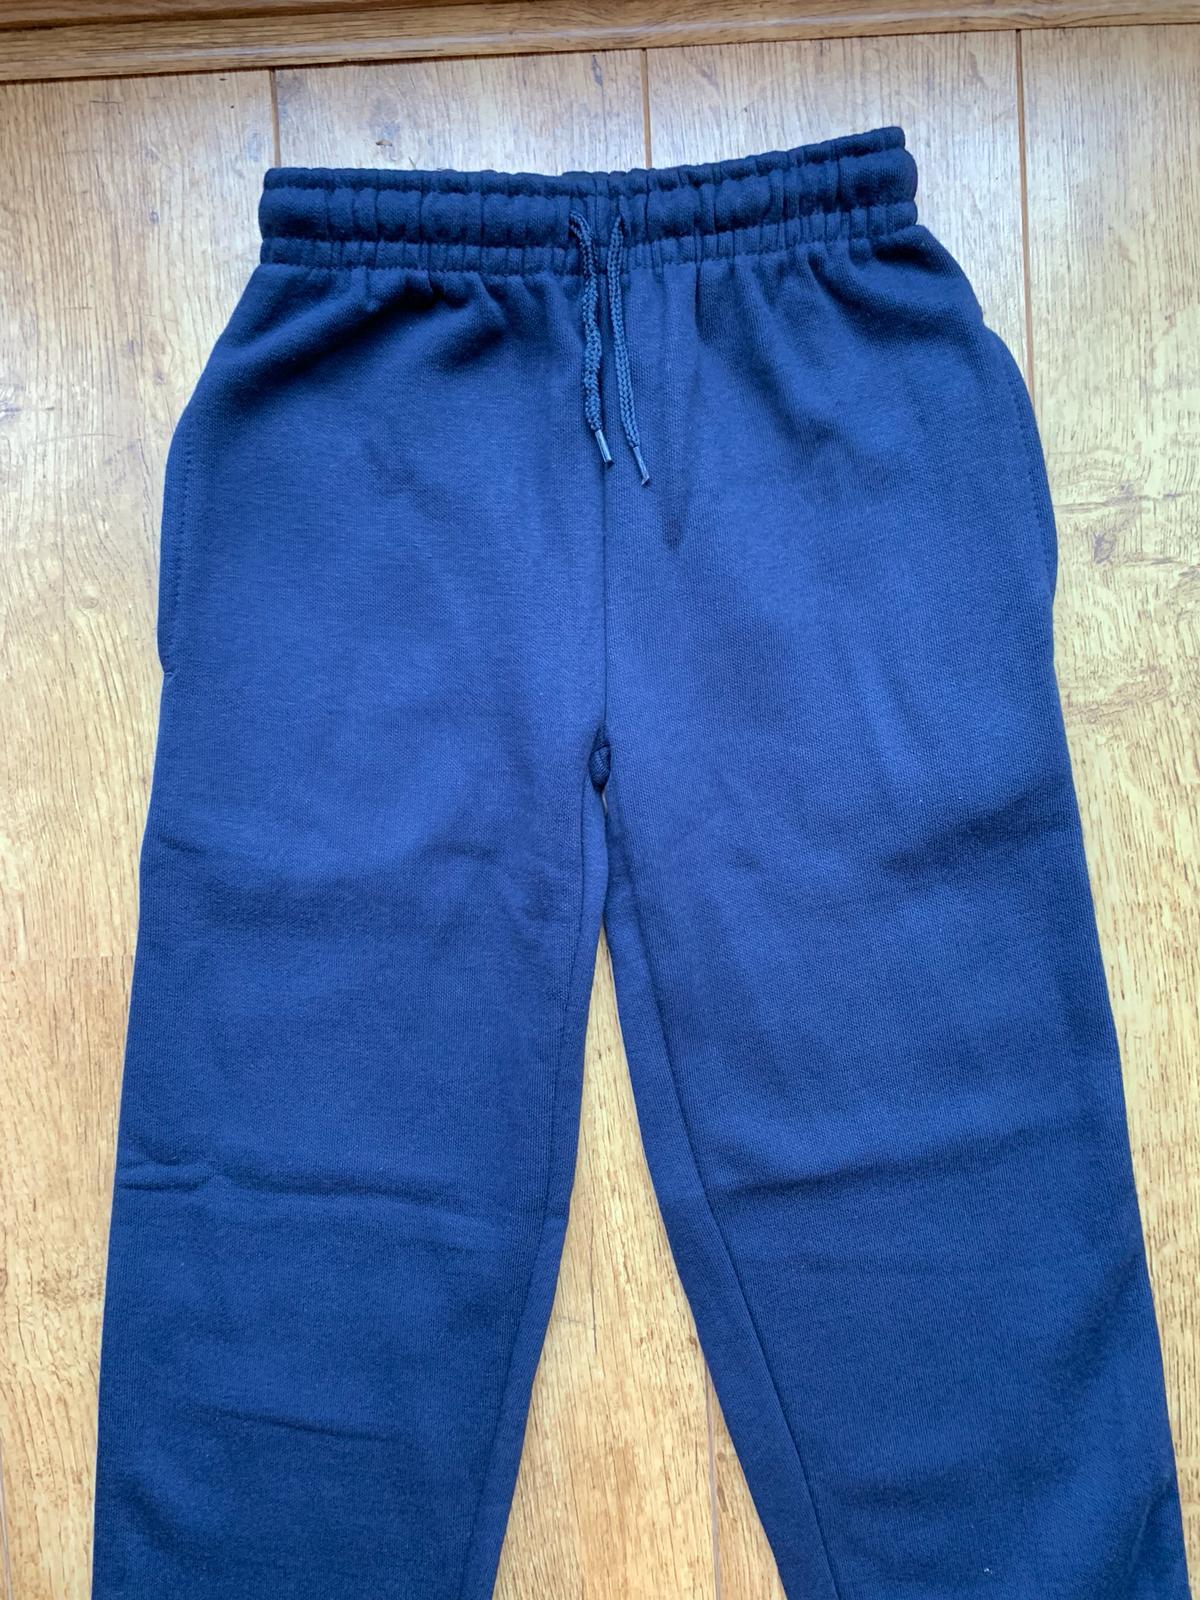 Busbridge PE Trousers